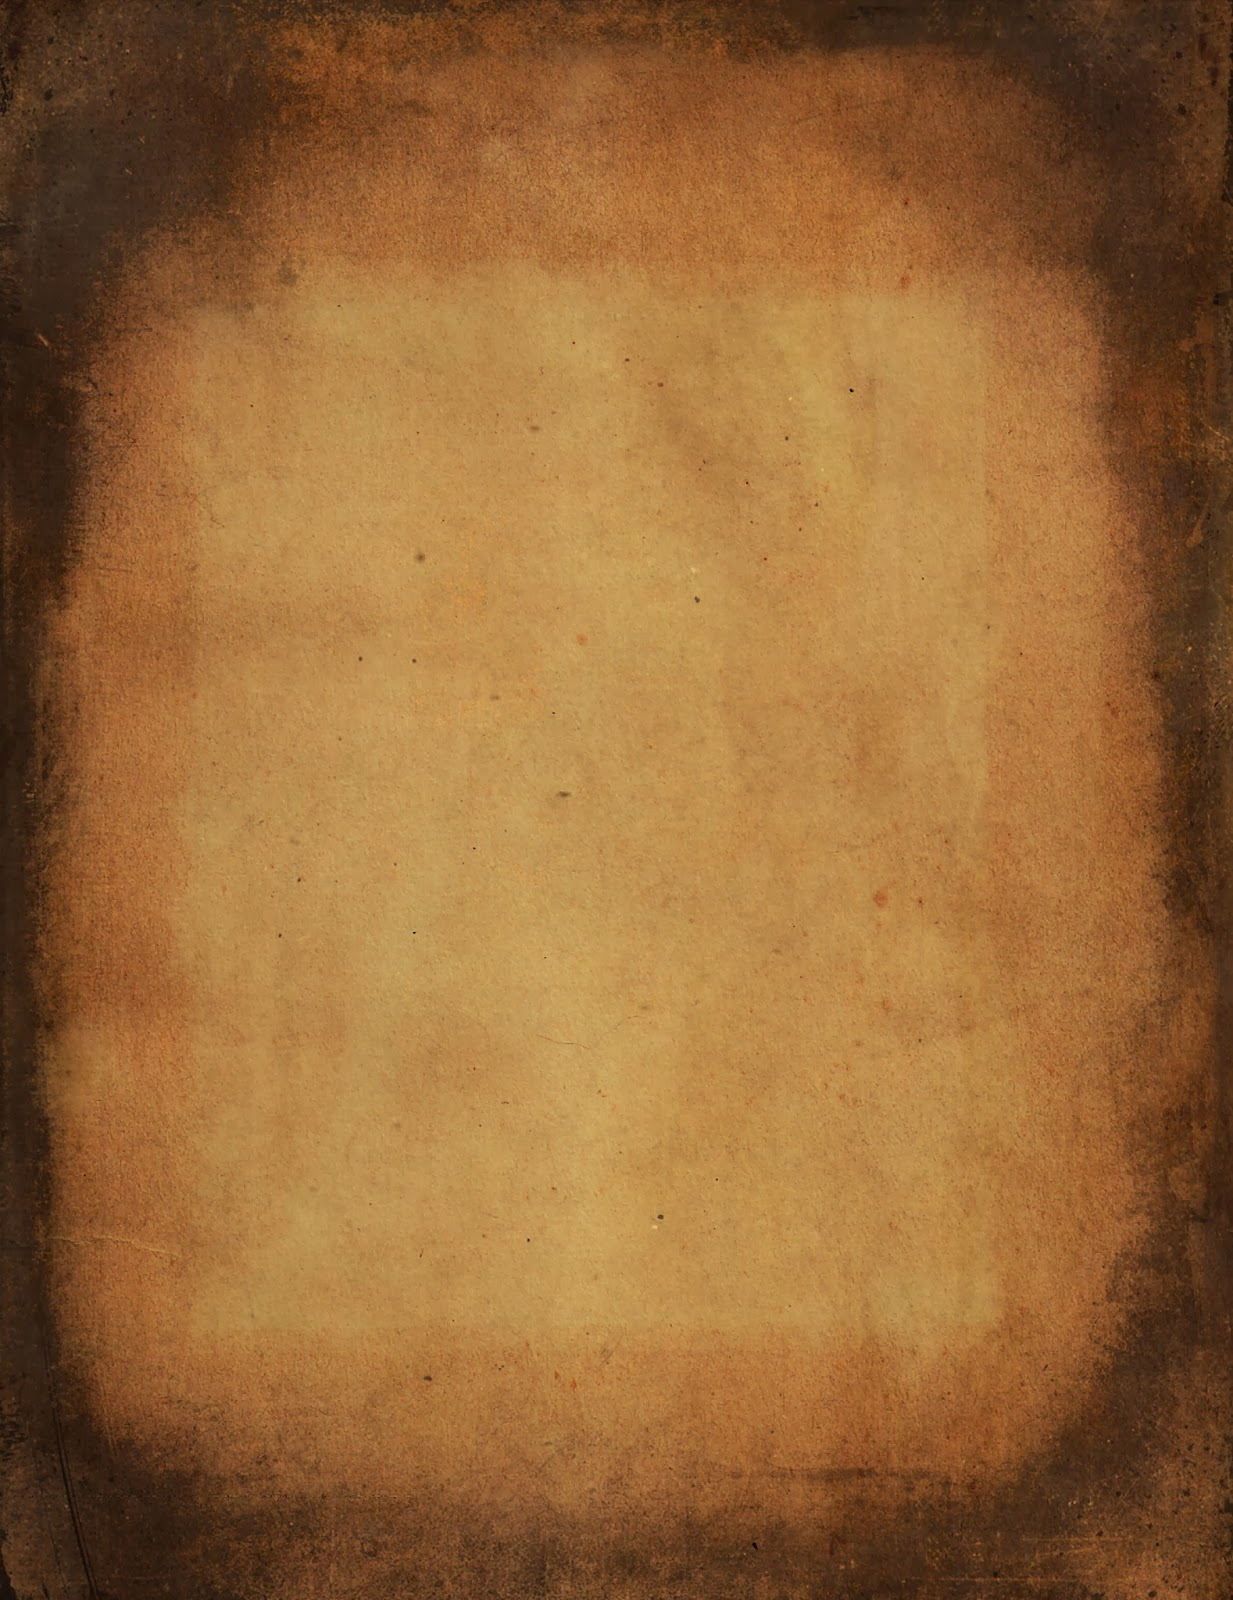 Antique Images: Free Digital Background: Printable Background Paper - Free Printable Backgrounds